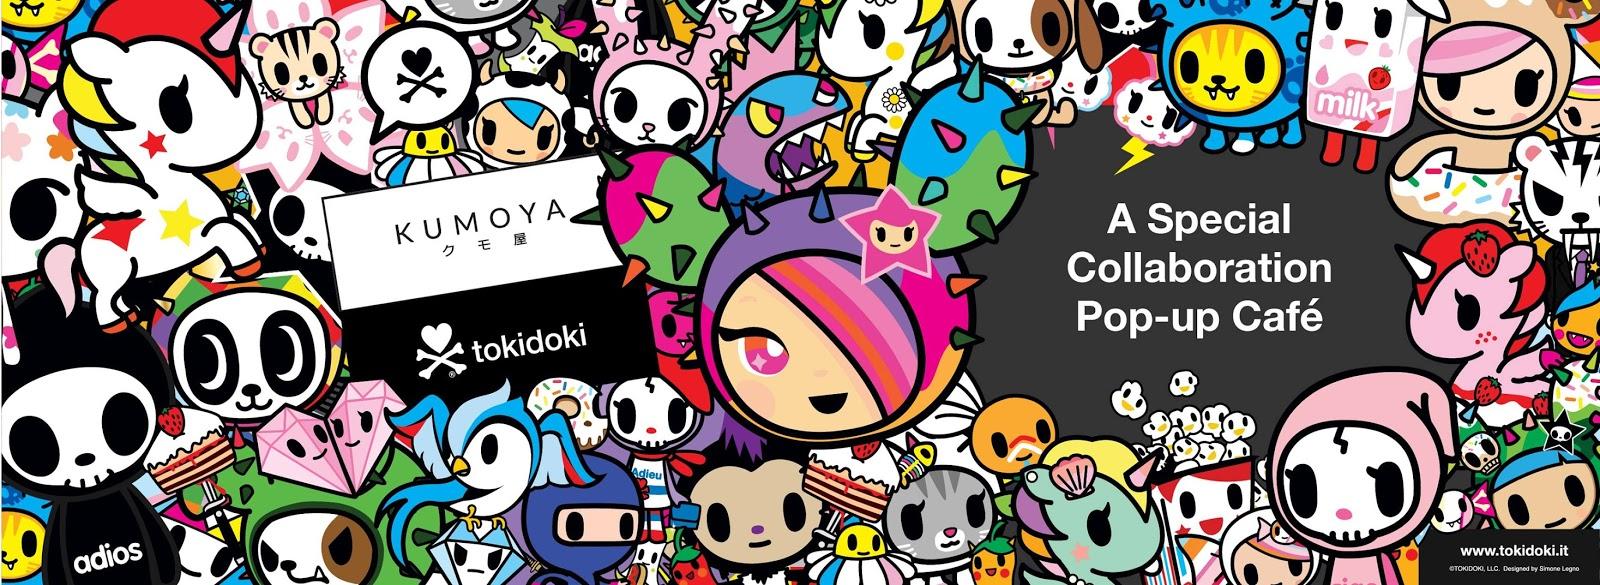 Kumoya X Tokidoki Pop Up Cafe In Singapore Opens March 29th